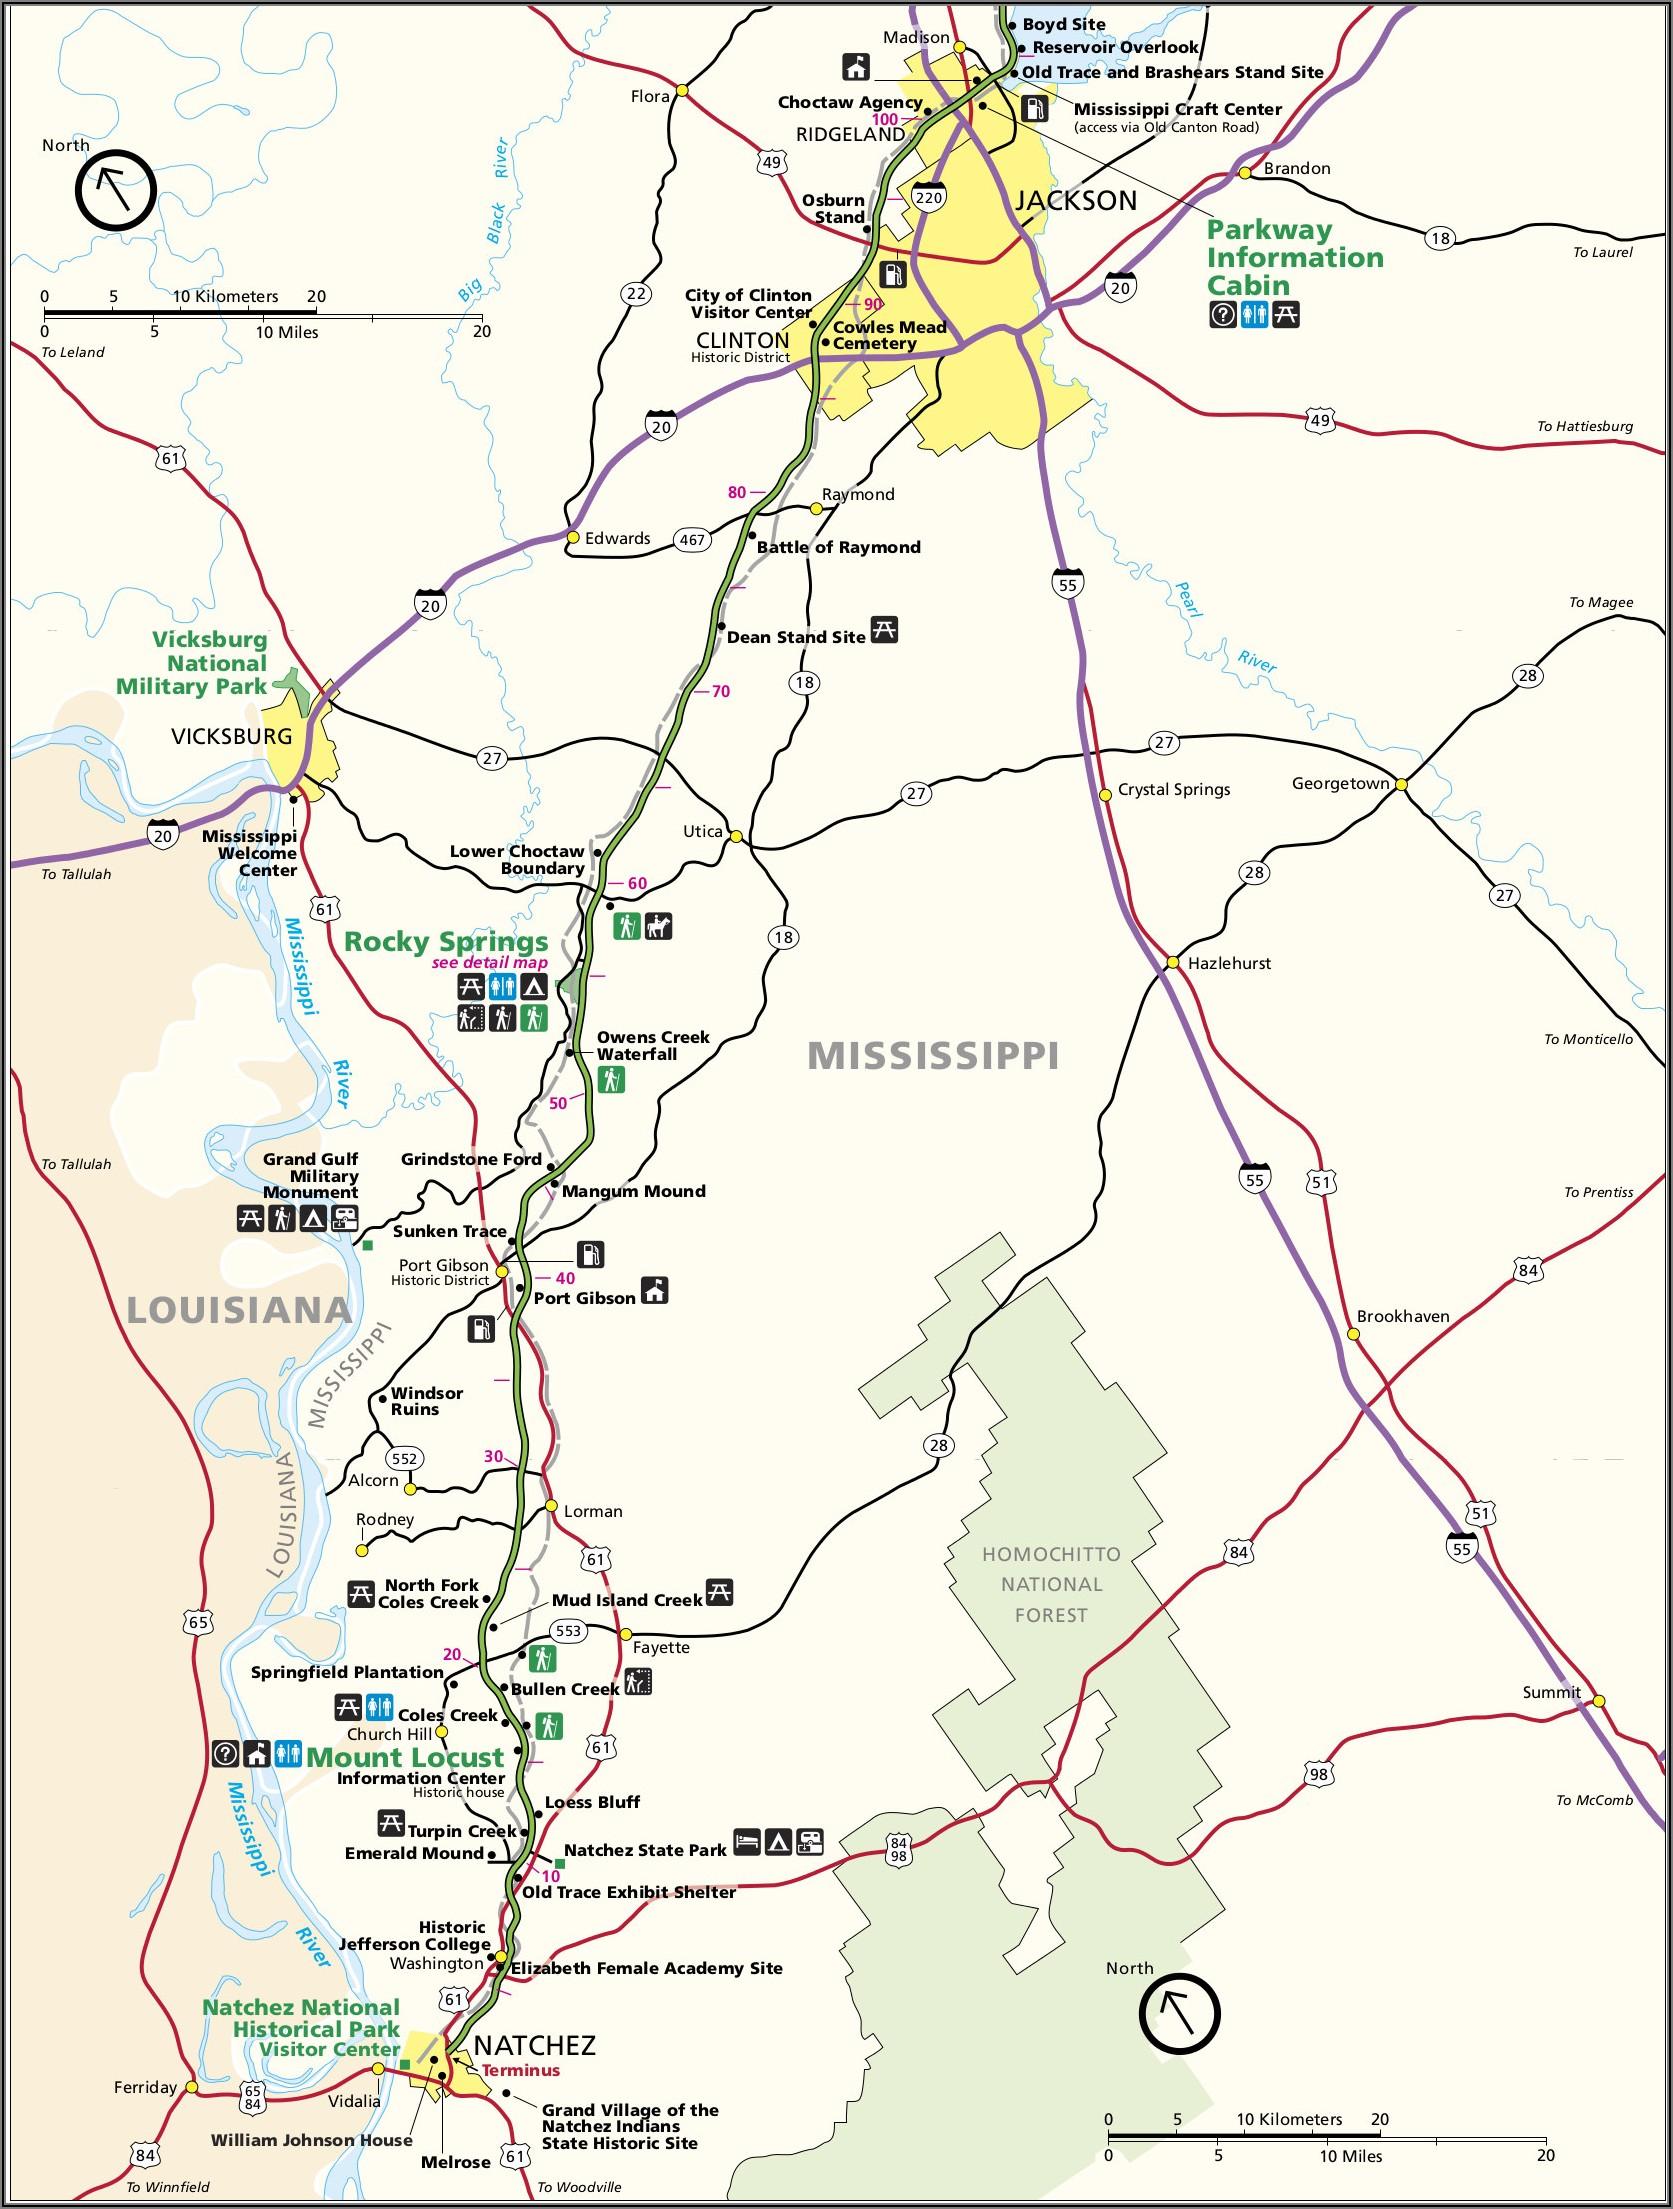 Natchez Trace Parkway Map Tn